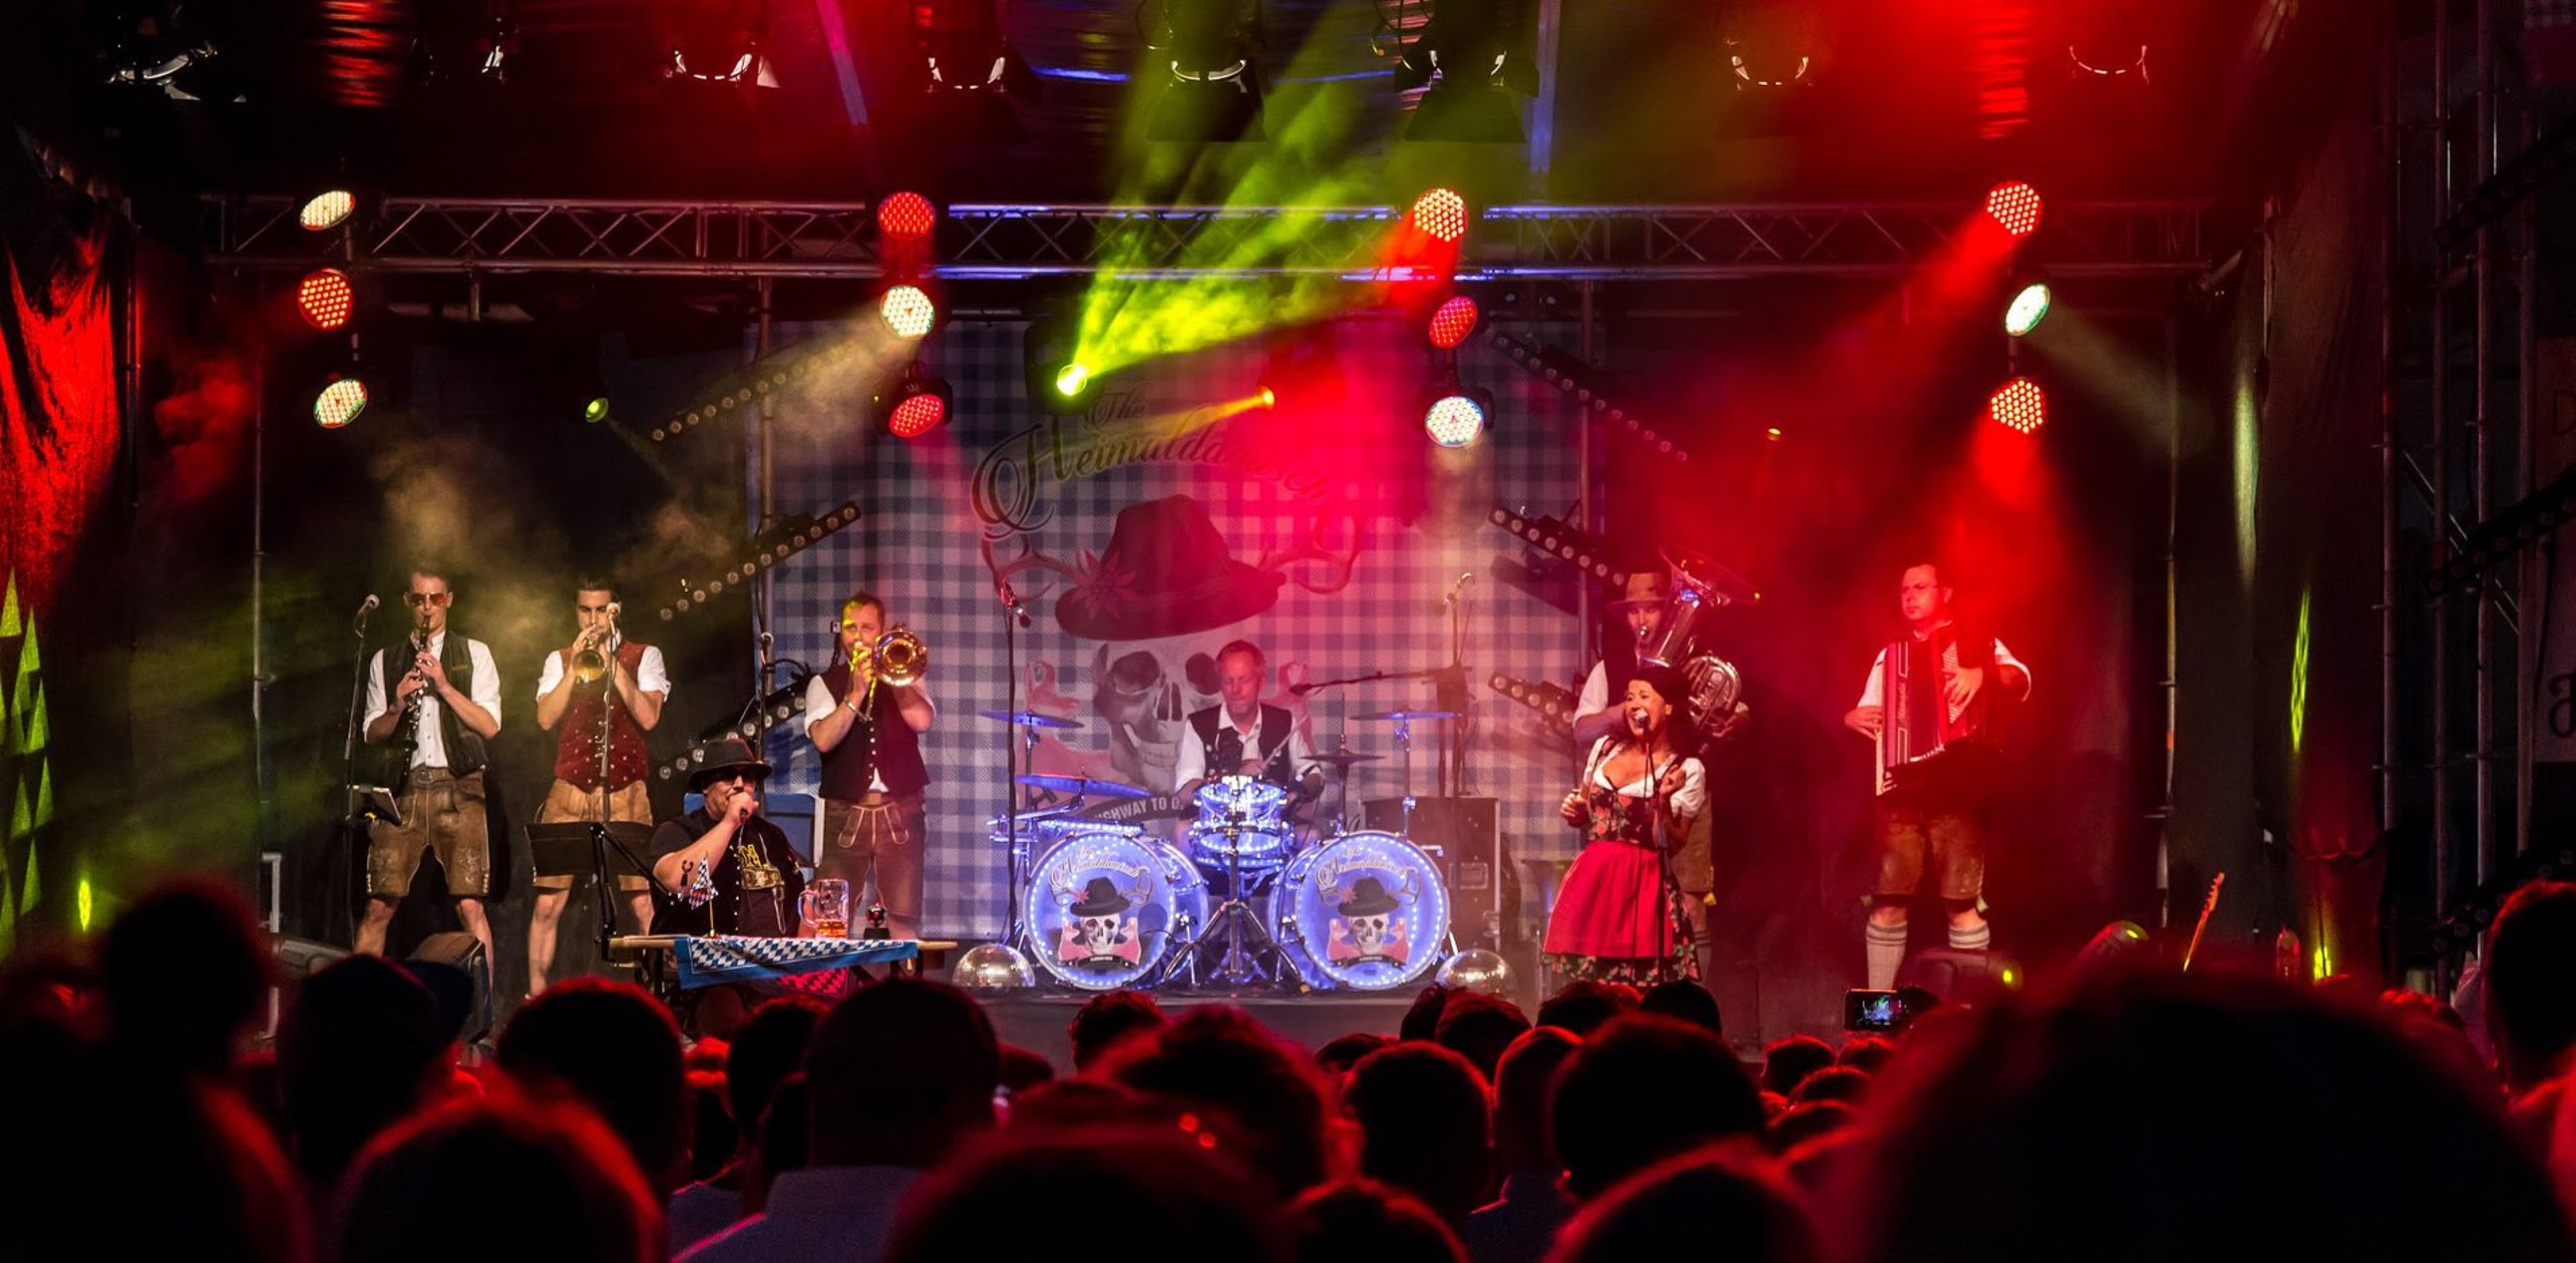 The Heimatdamisch - Circus Oberkrain